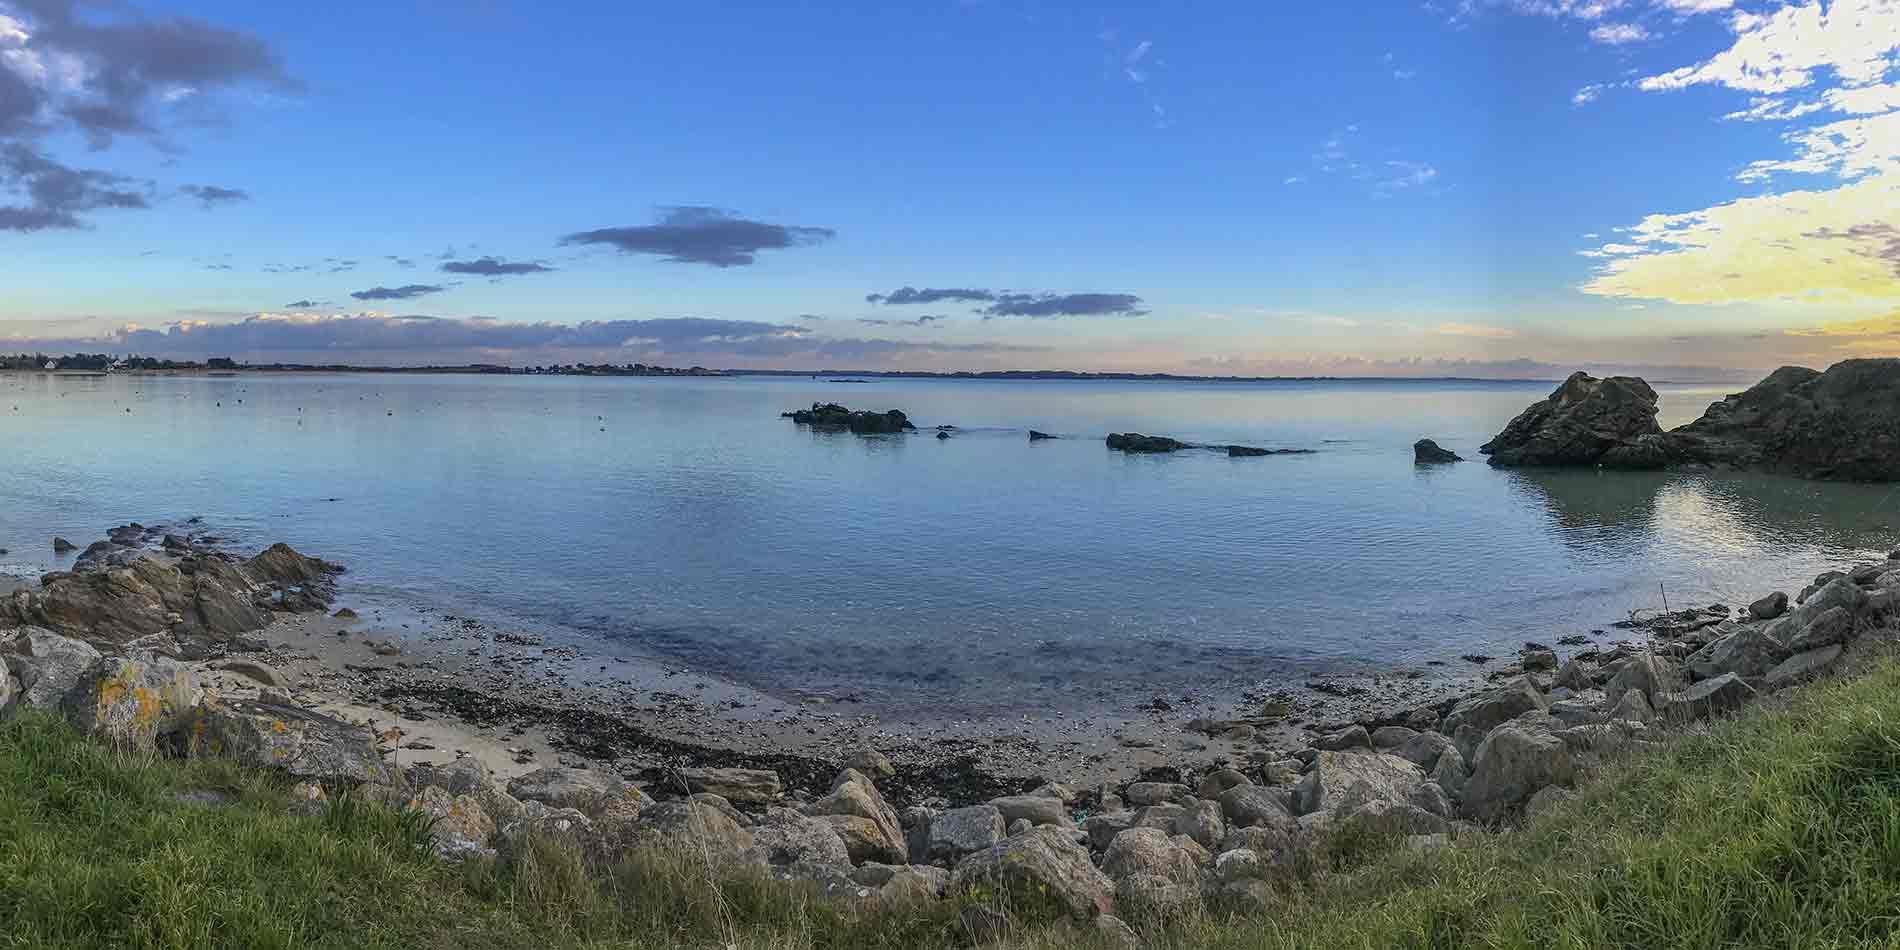 Camping Vannes, Golfe Du Morbihan | Camping Morbihan ... concernant Camping Golf Du Morbihan Avec Piscine